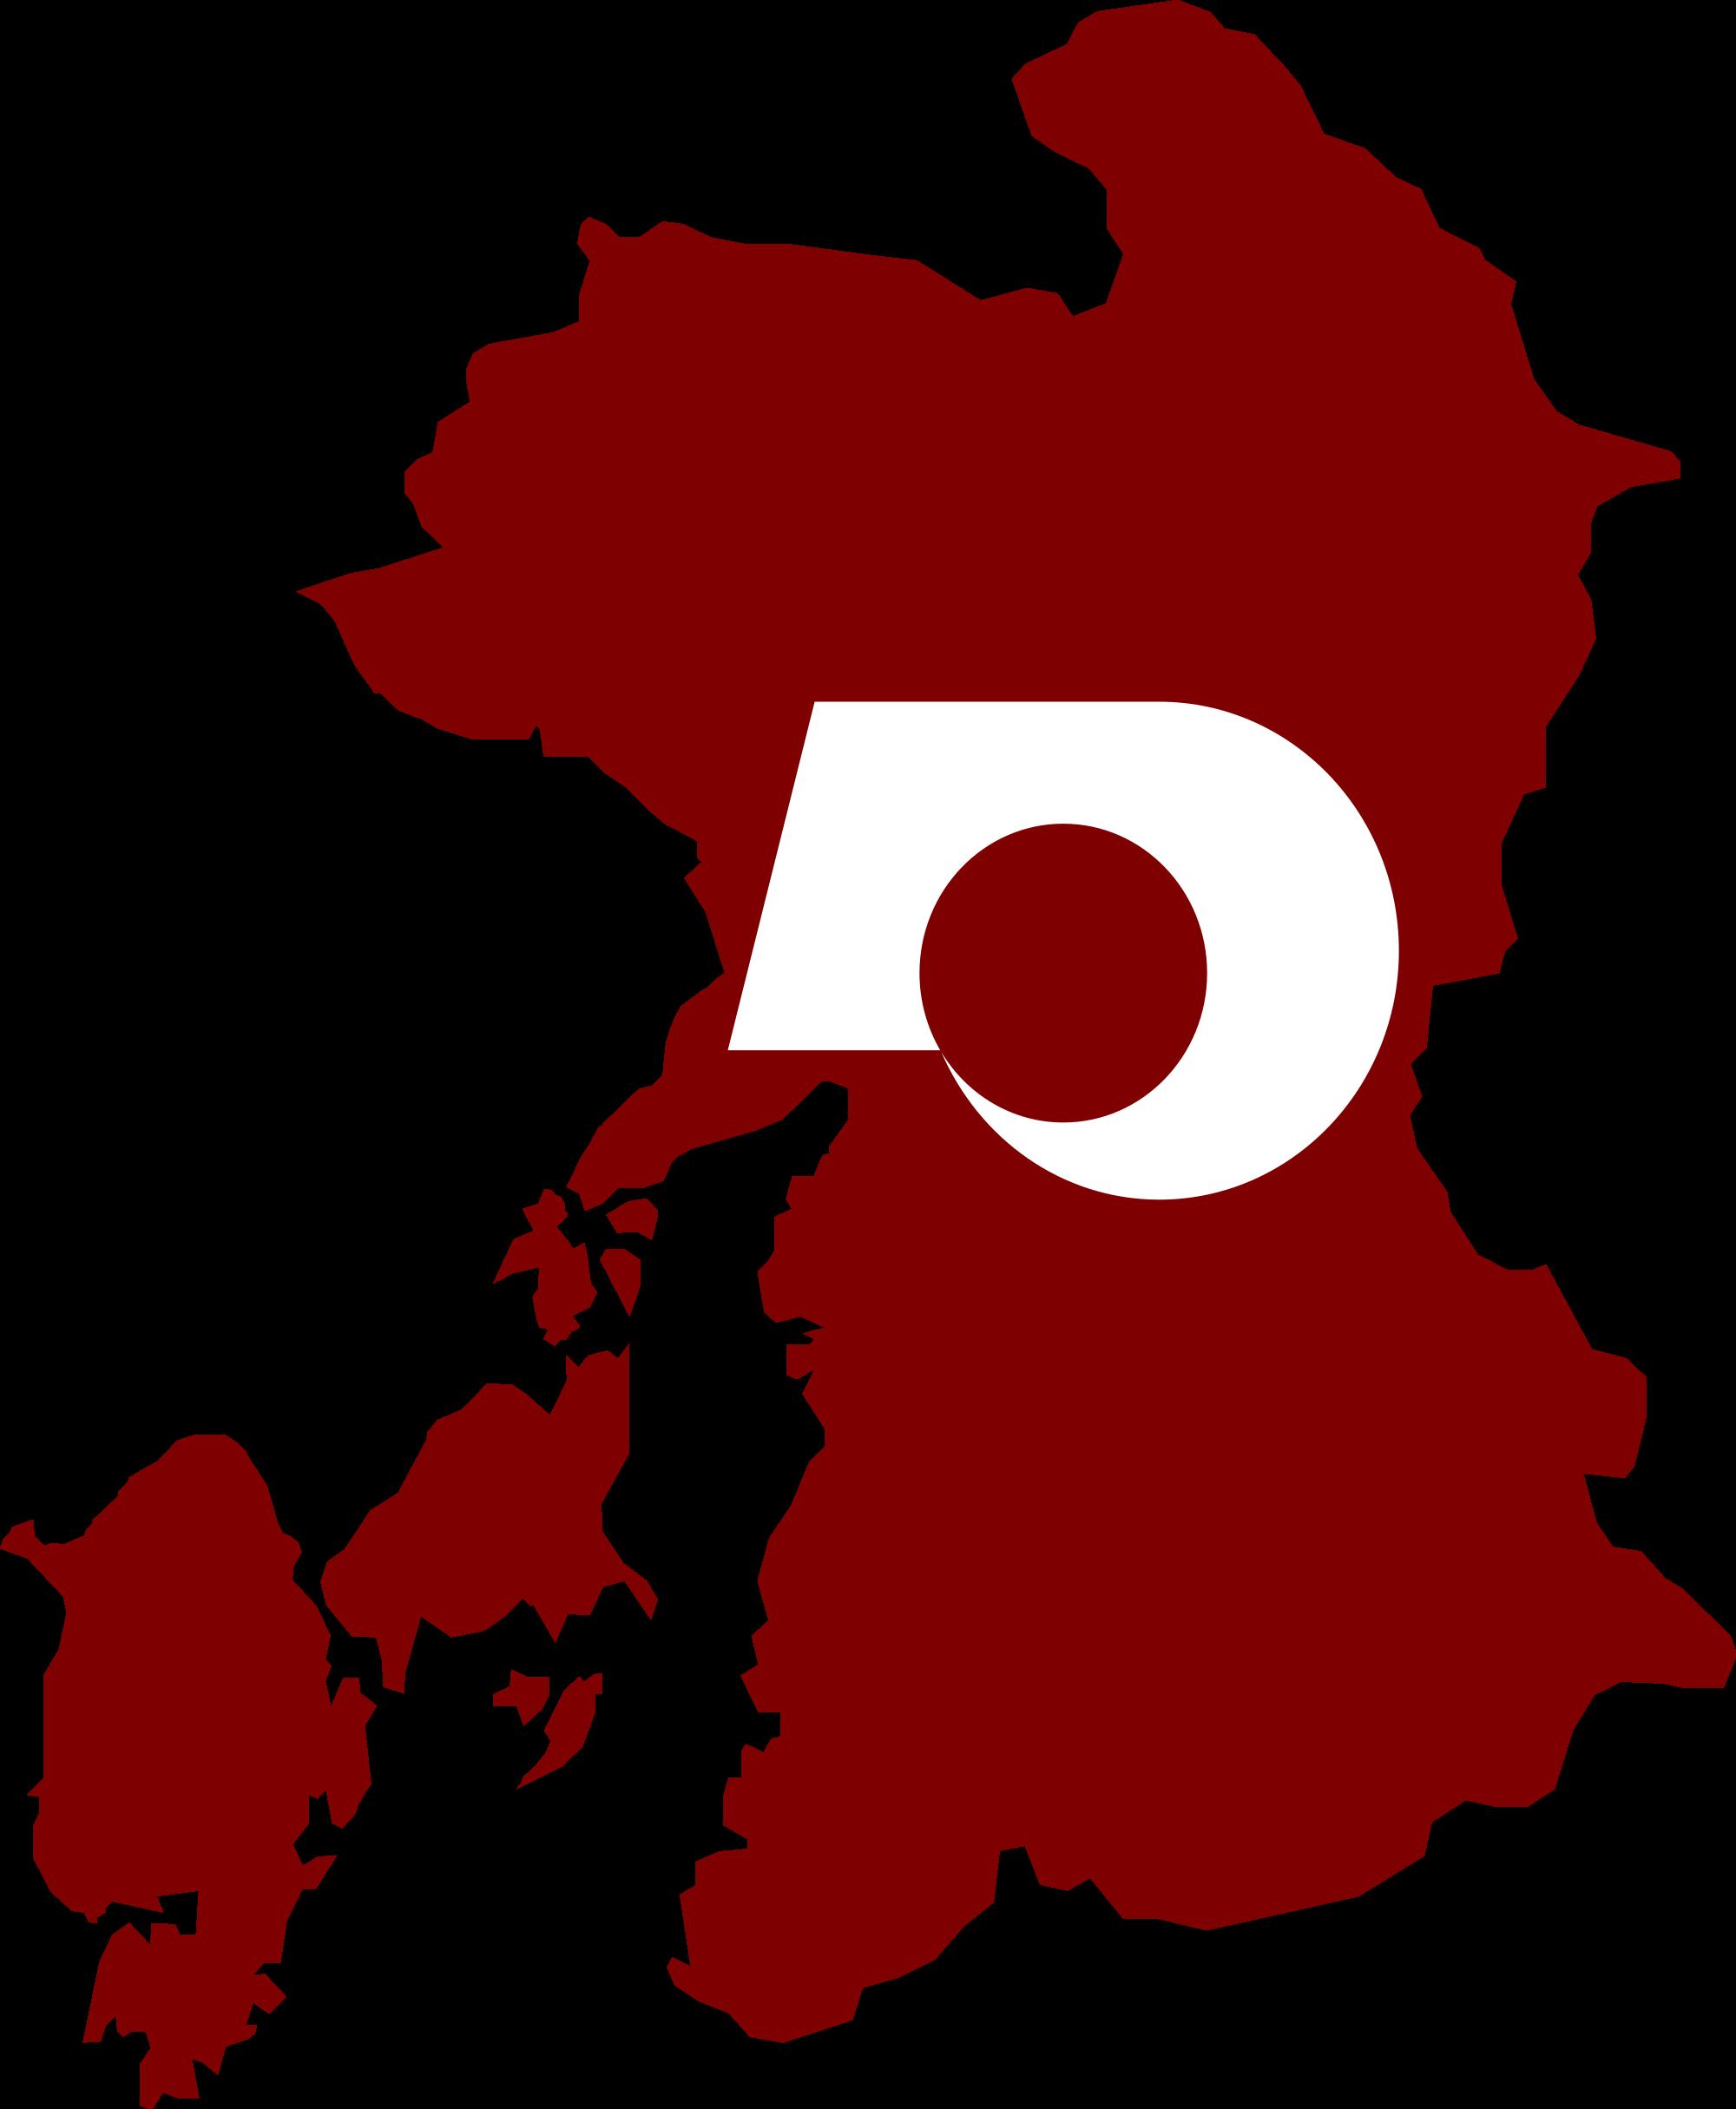 File:Flag map of Kumamoto Prefecture.svg.